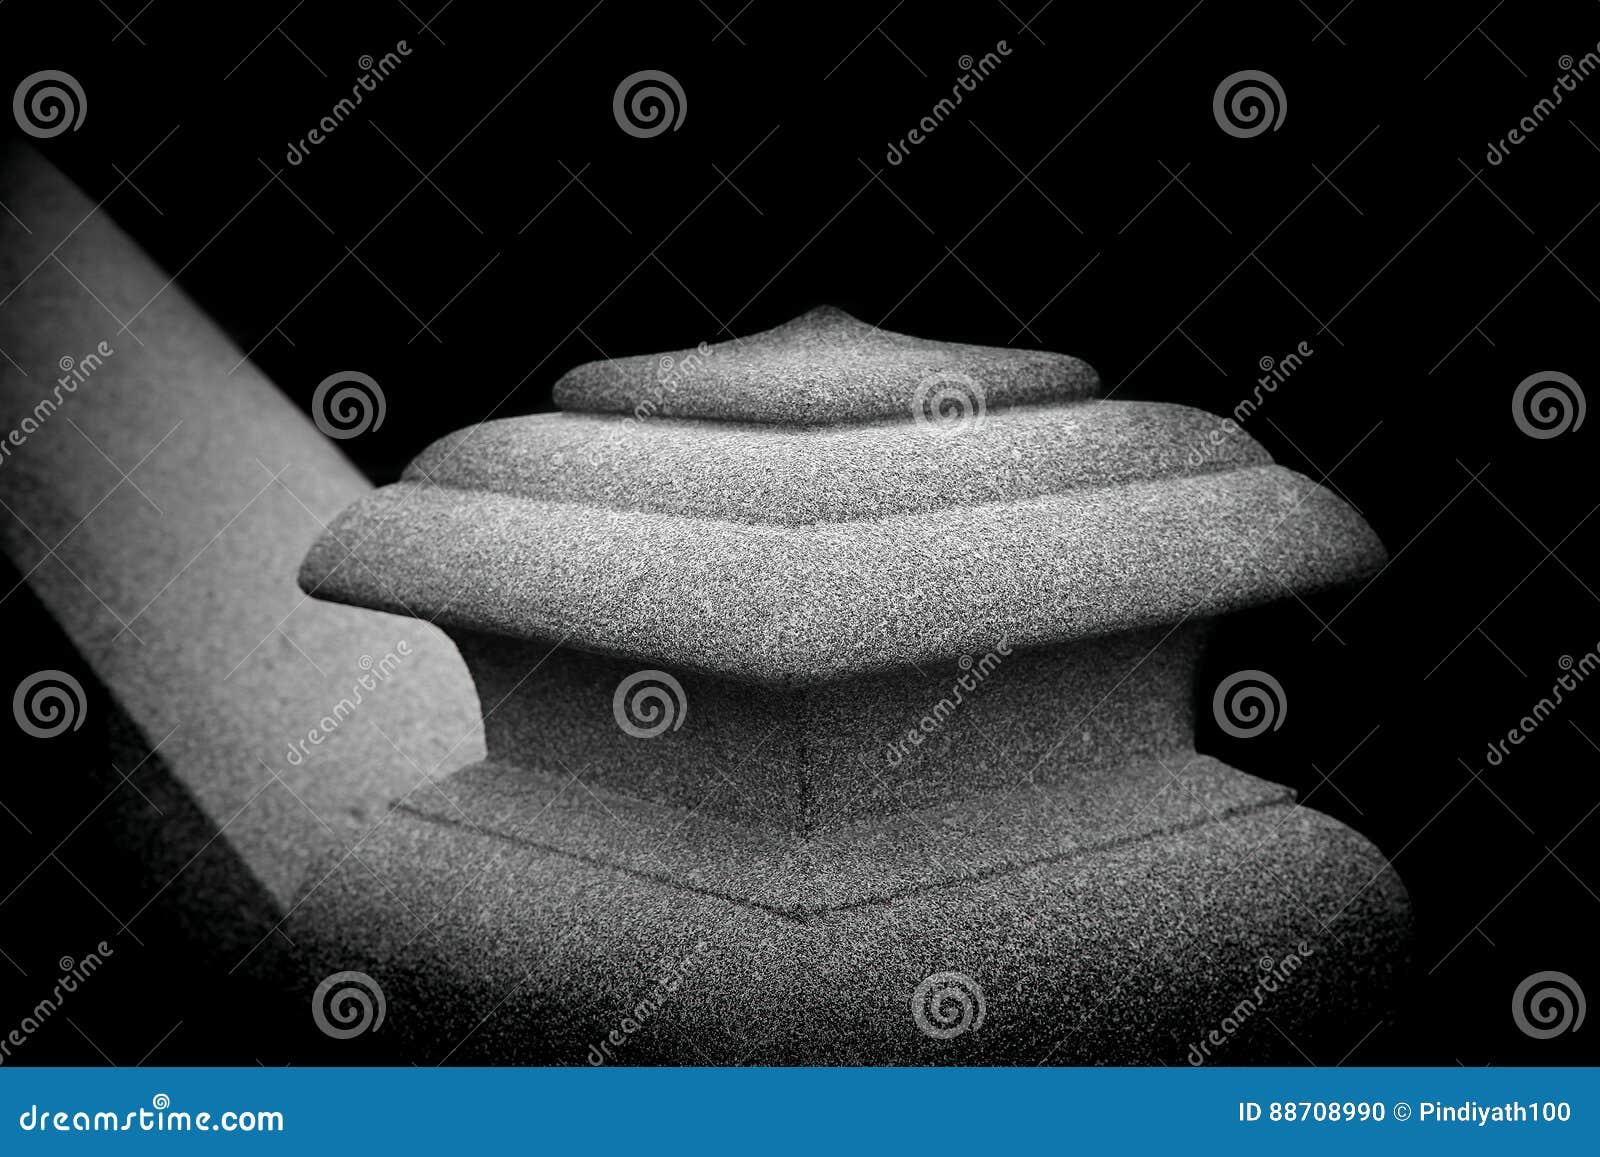 Stone pillar or column head